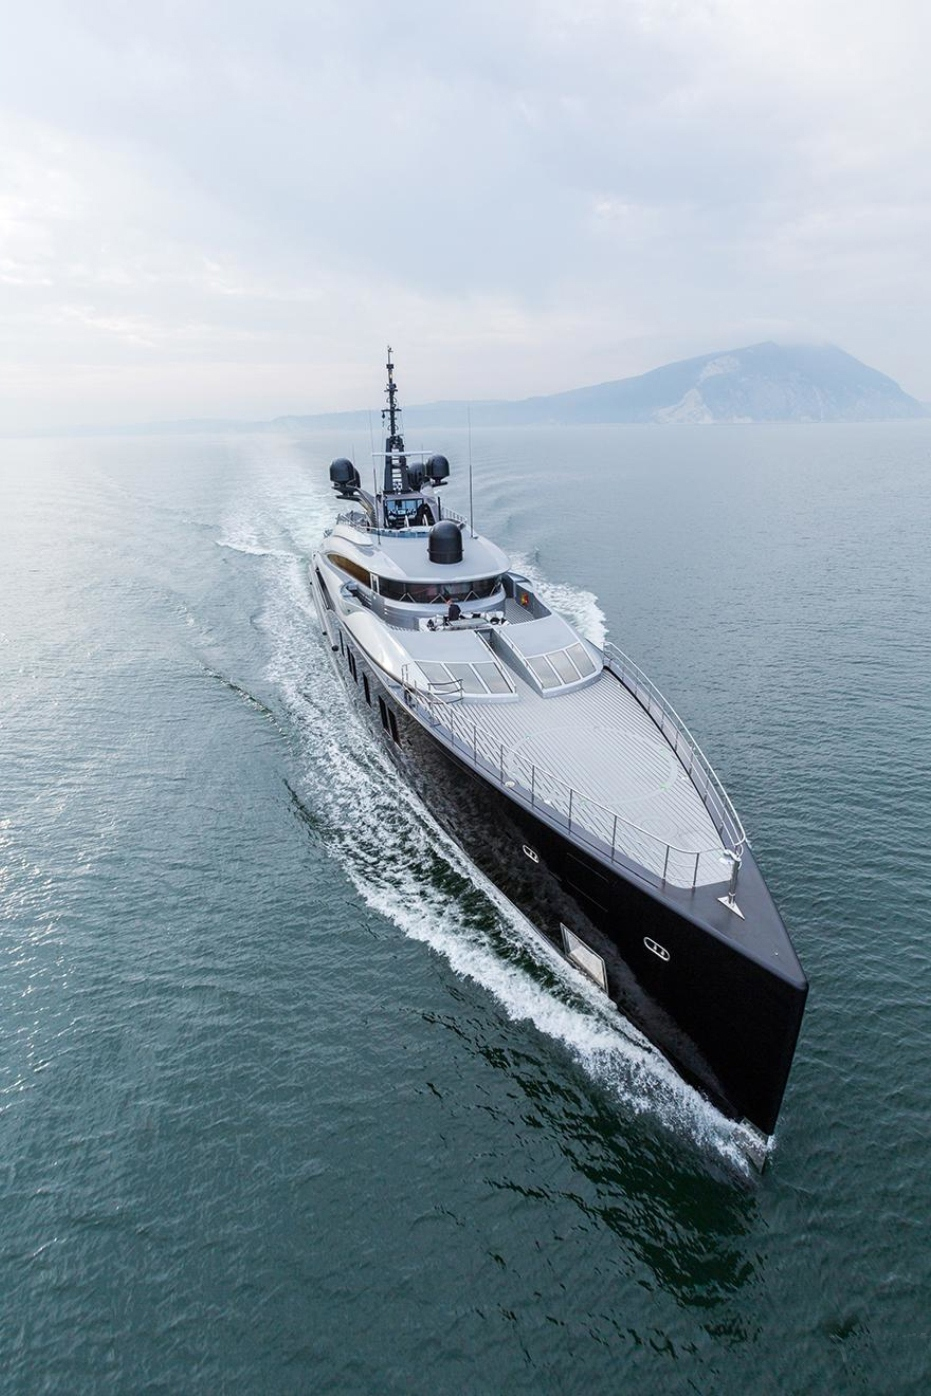 okto 66m isa superyacht boat ship submarine sea ocean water